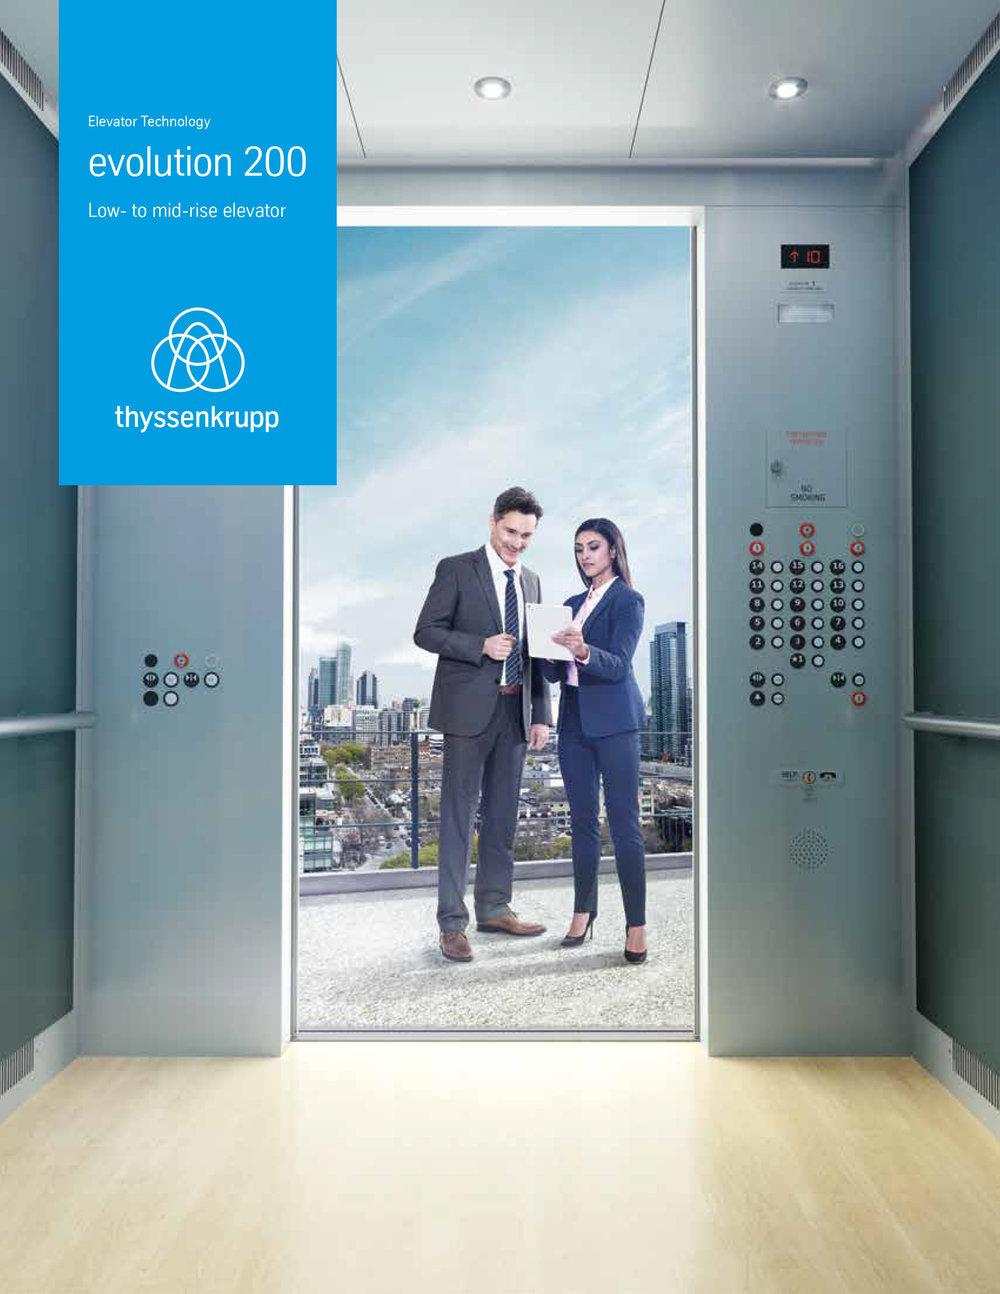 evolution 200 brochure